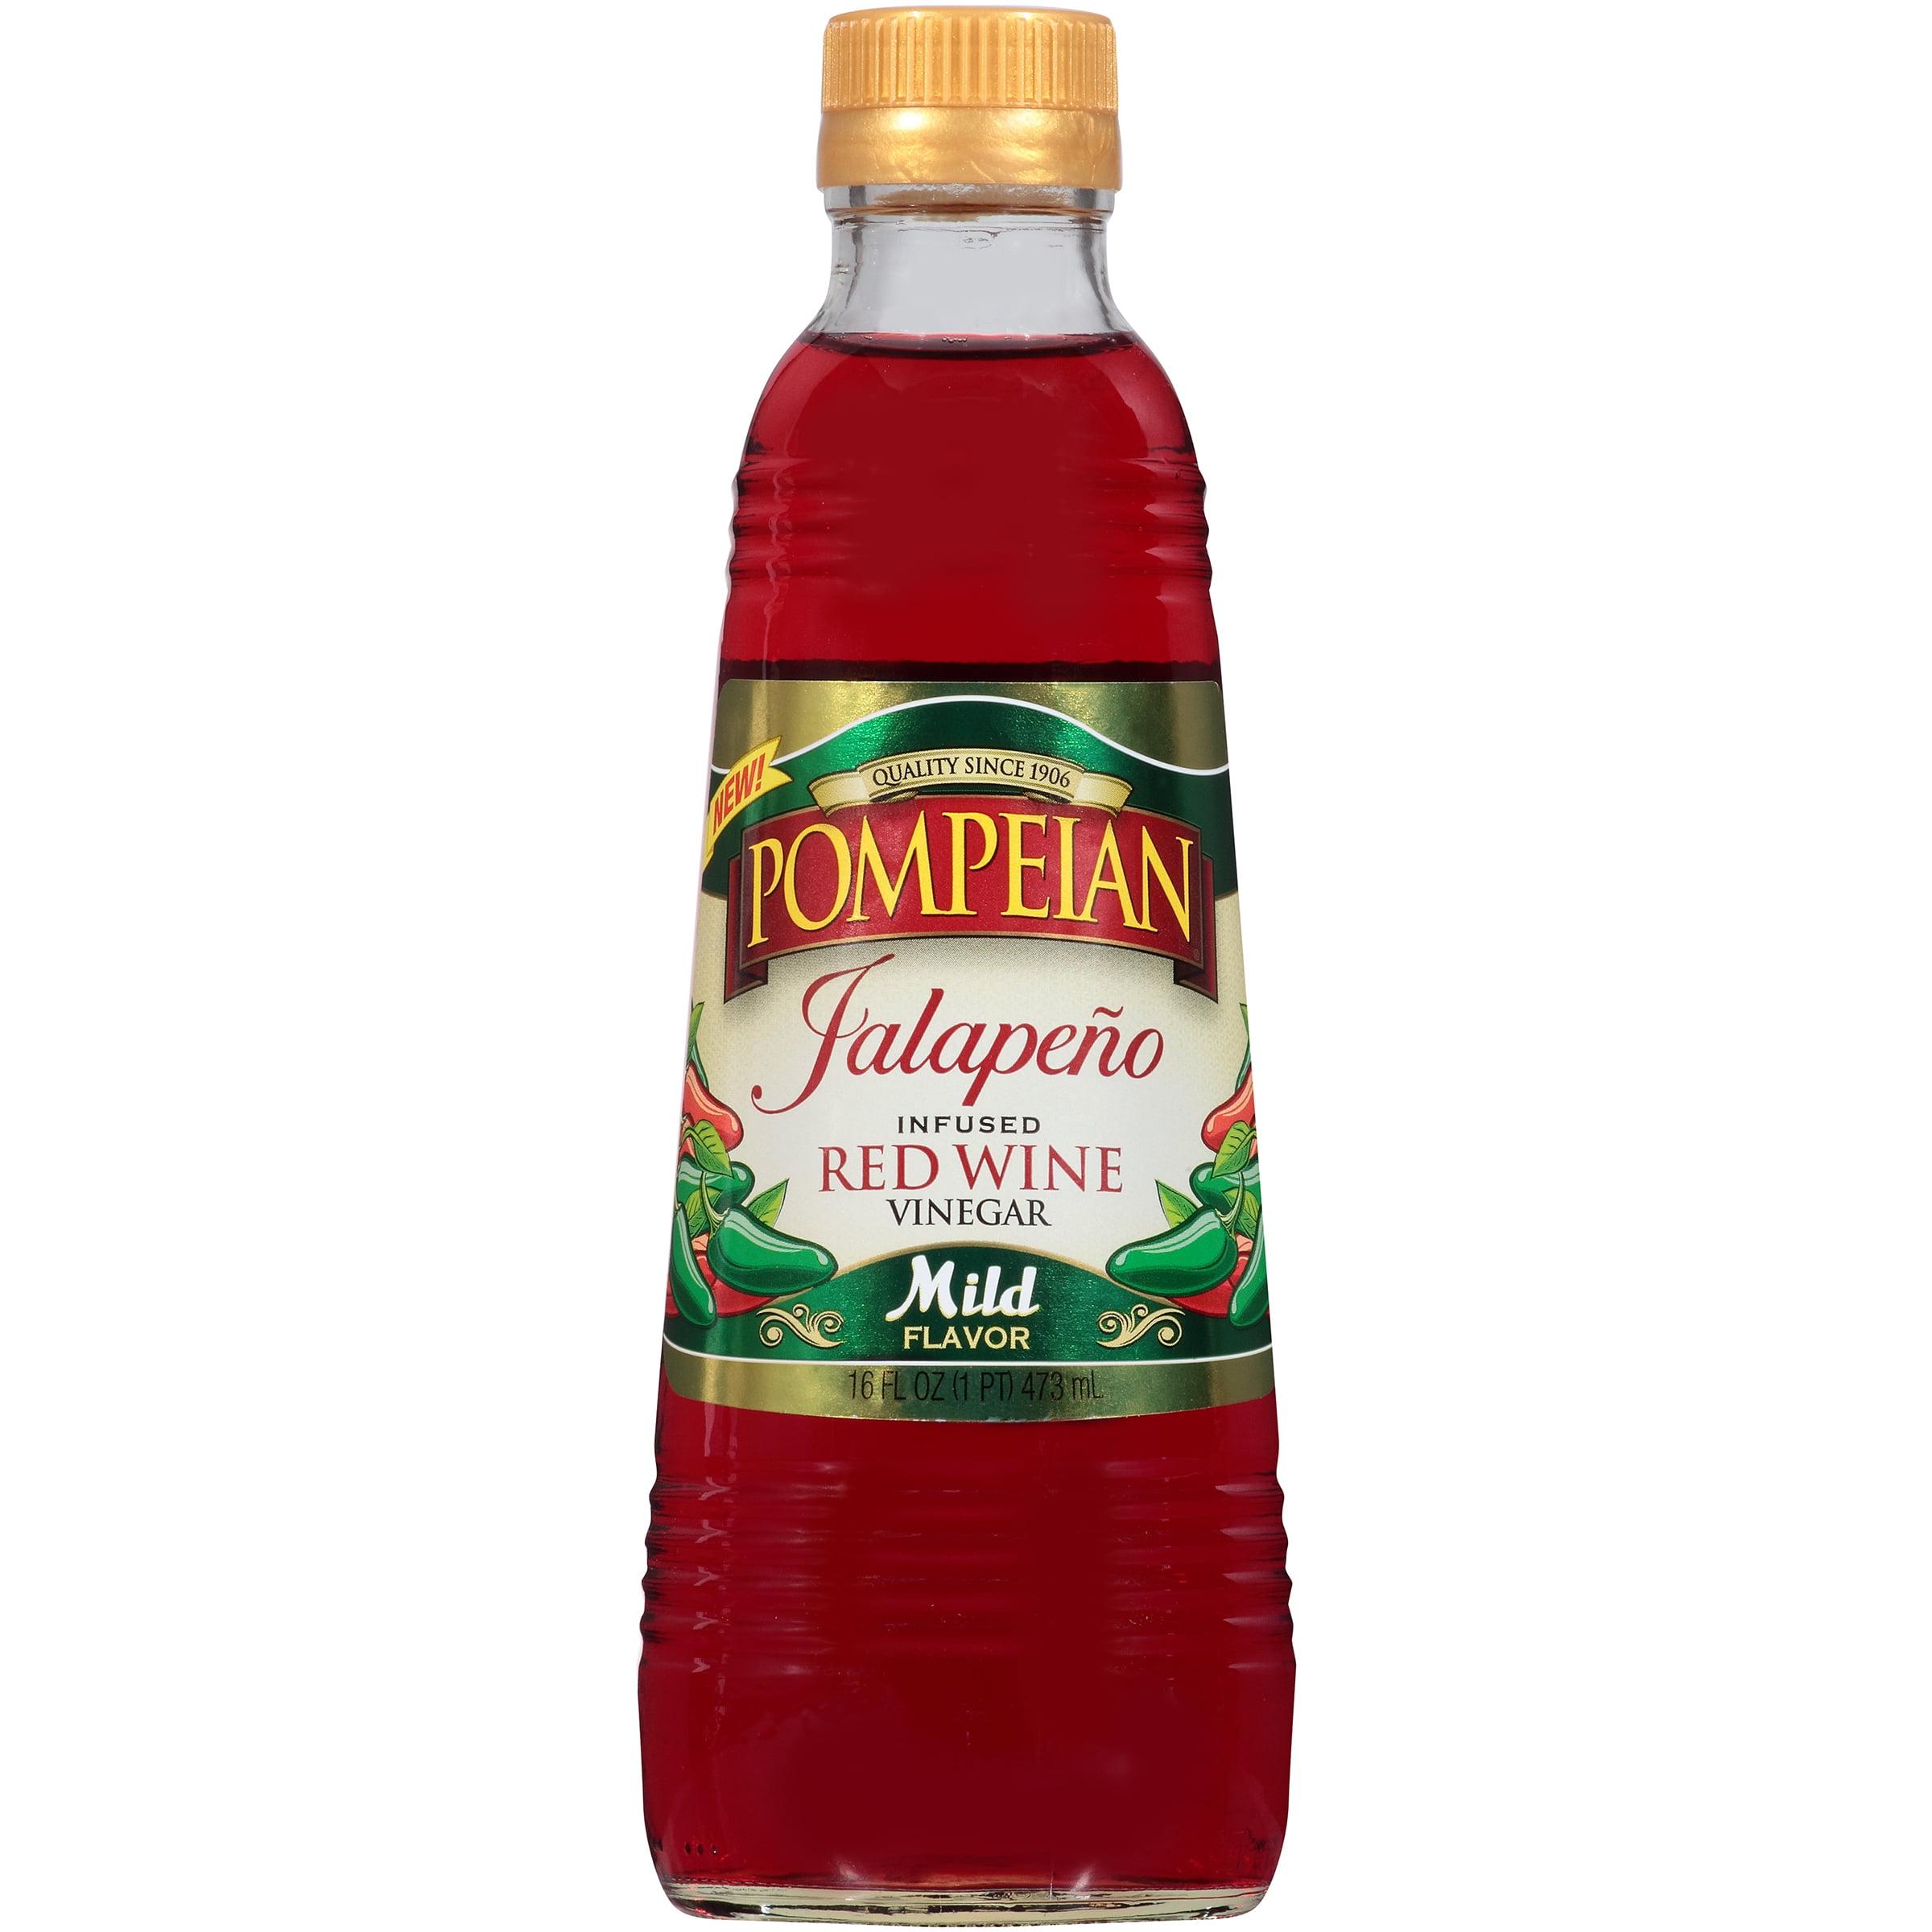 **Disco'd** Pompeian® Jalapeno Infused Red Wine Vinegar 16 fl. oz. Bottle